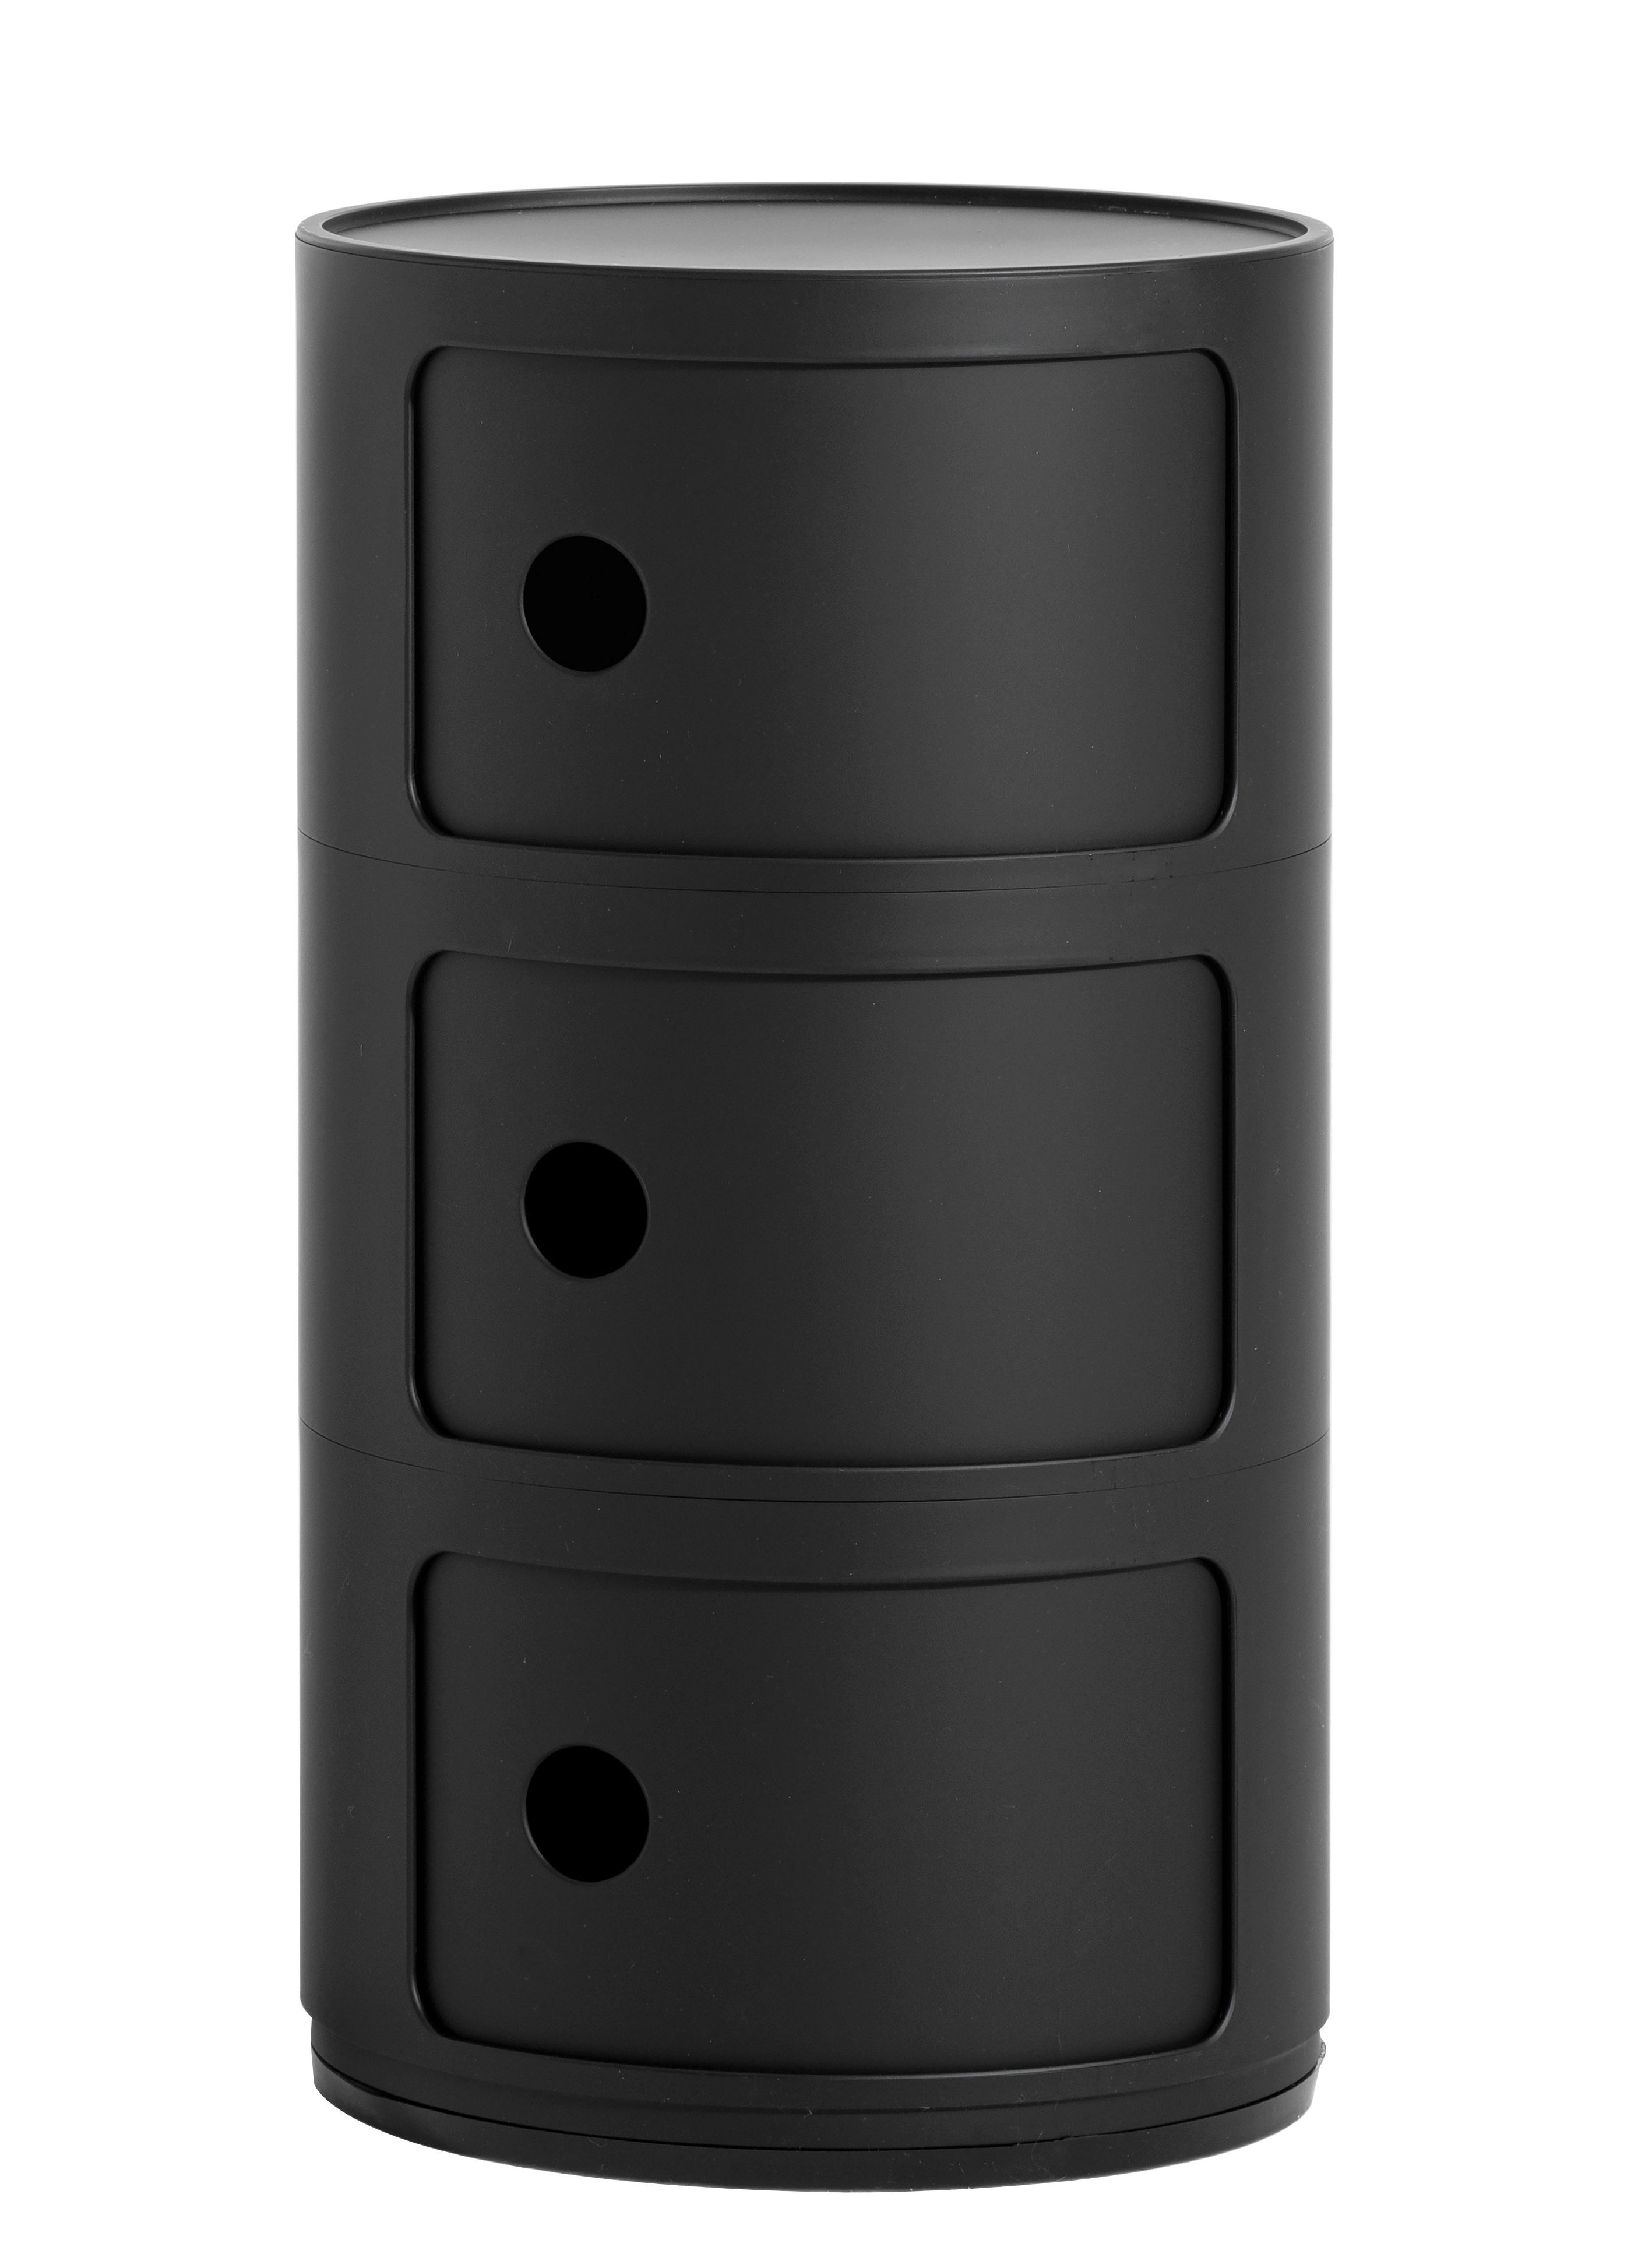 Mobilier - Mobilier Kids - Rangement Componibili / Version mate - 3 tiroirs - H 58 cm - Kartell - Noir mat - ABS